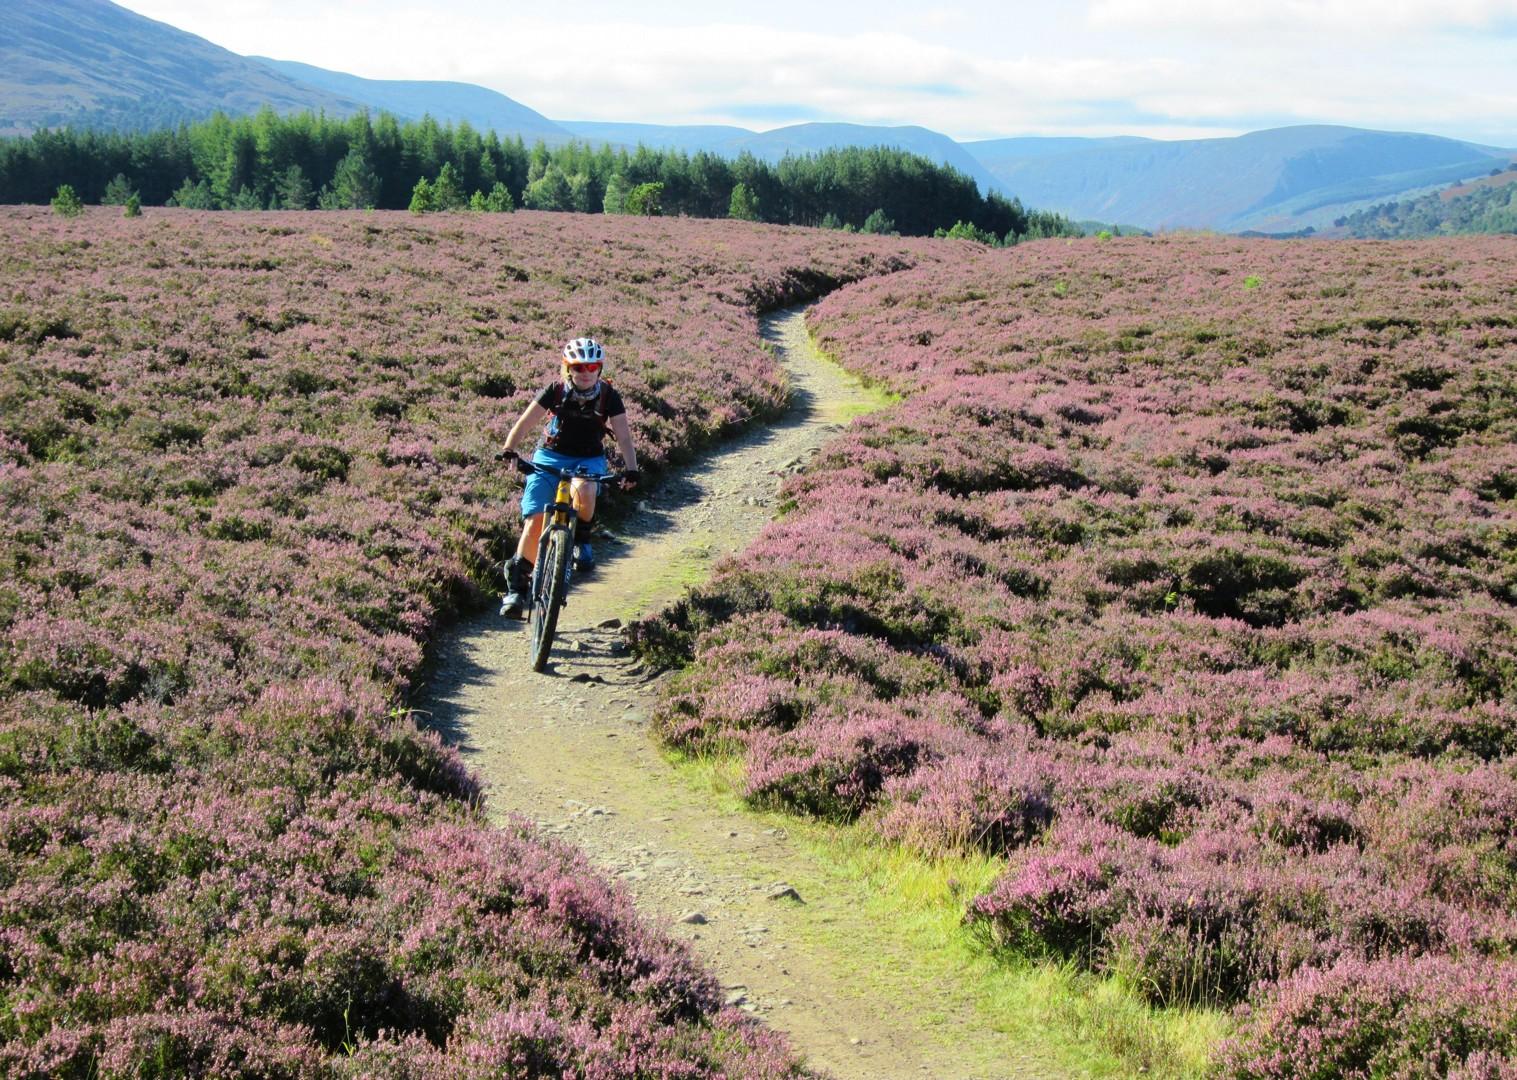 highland-biking-trails-scottish-highlands.jpg - Scotland - Highlands Coast to Coast - Mountain Biking